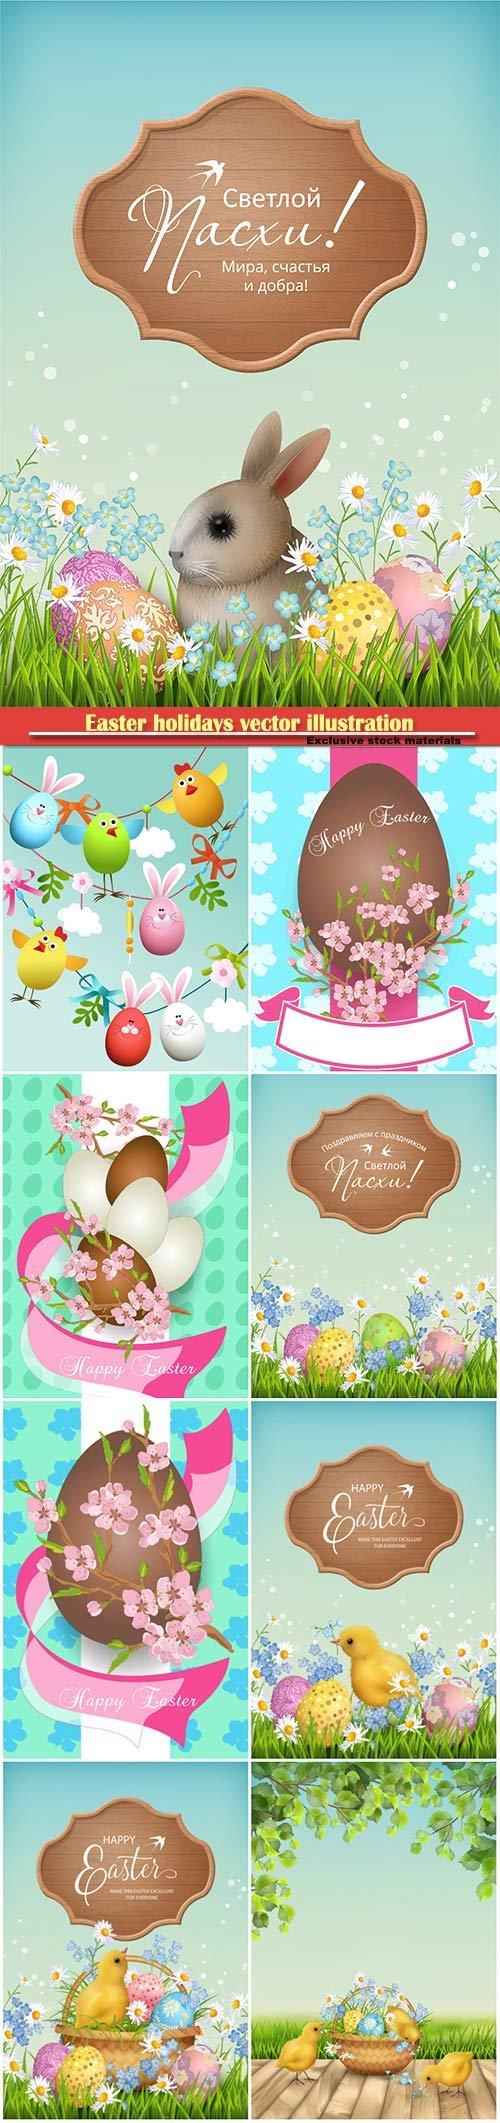 Easter holidays vector illustration # 6